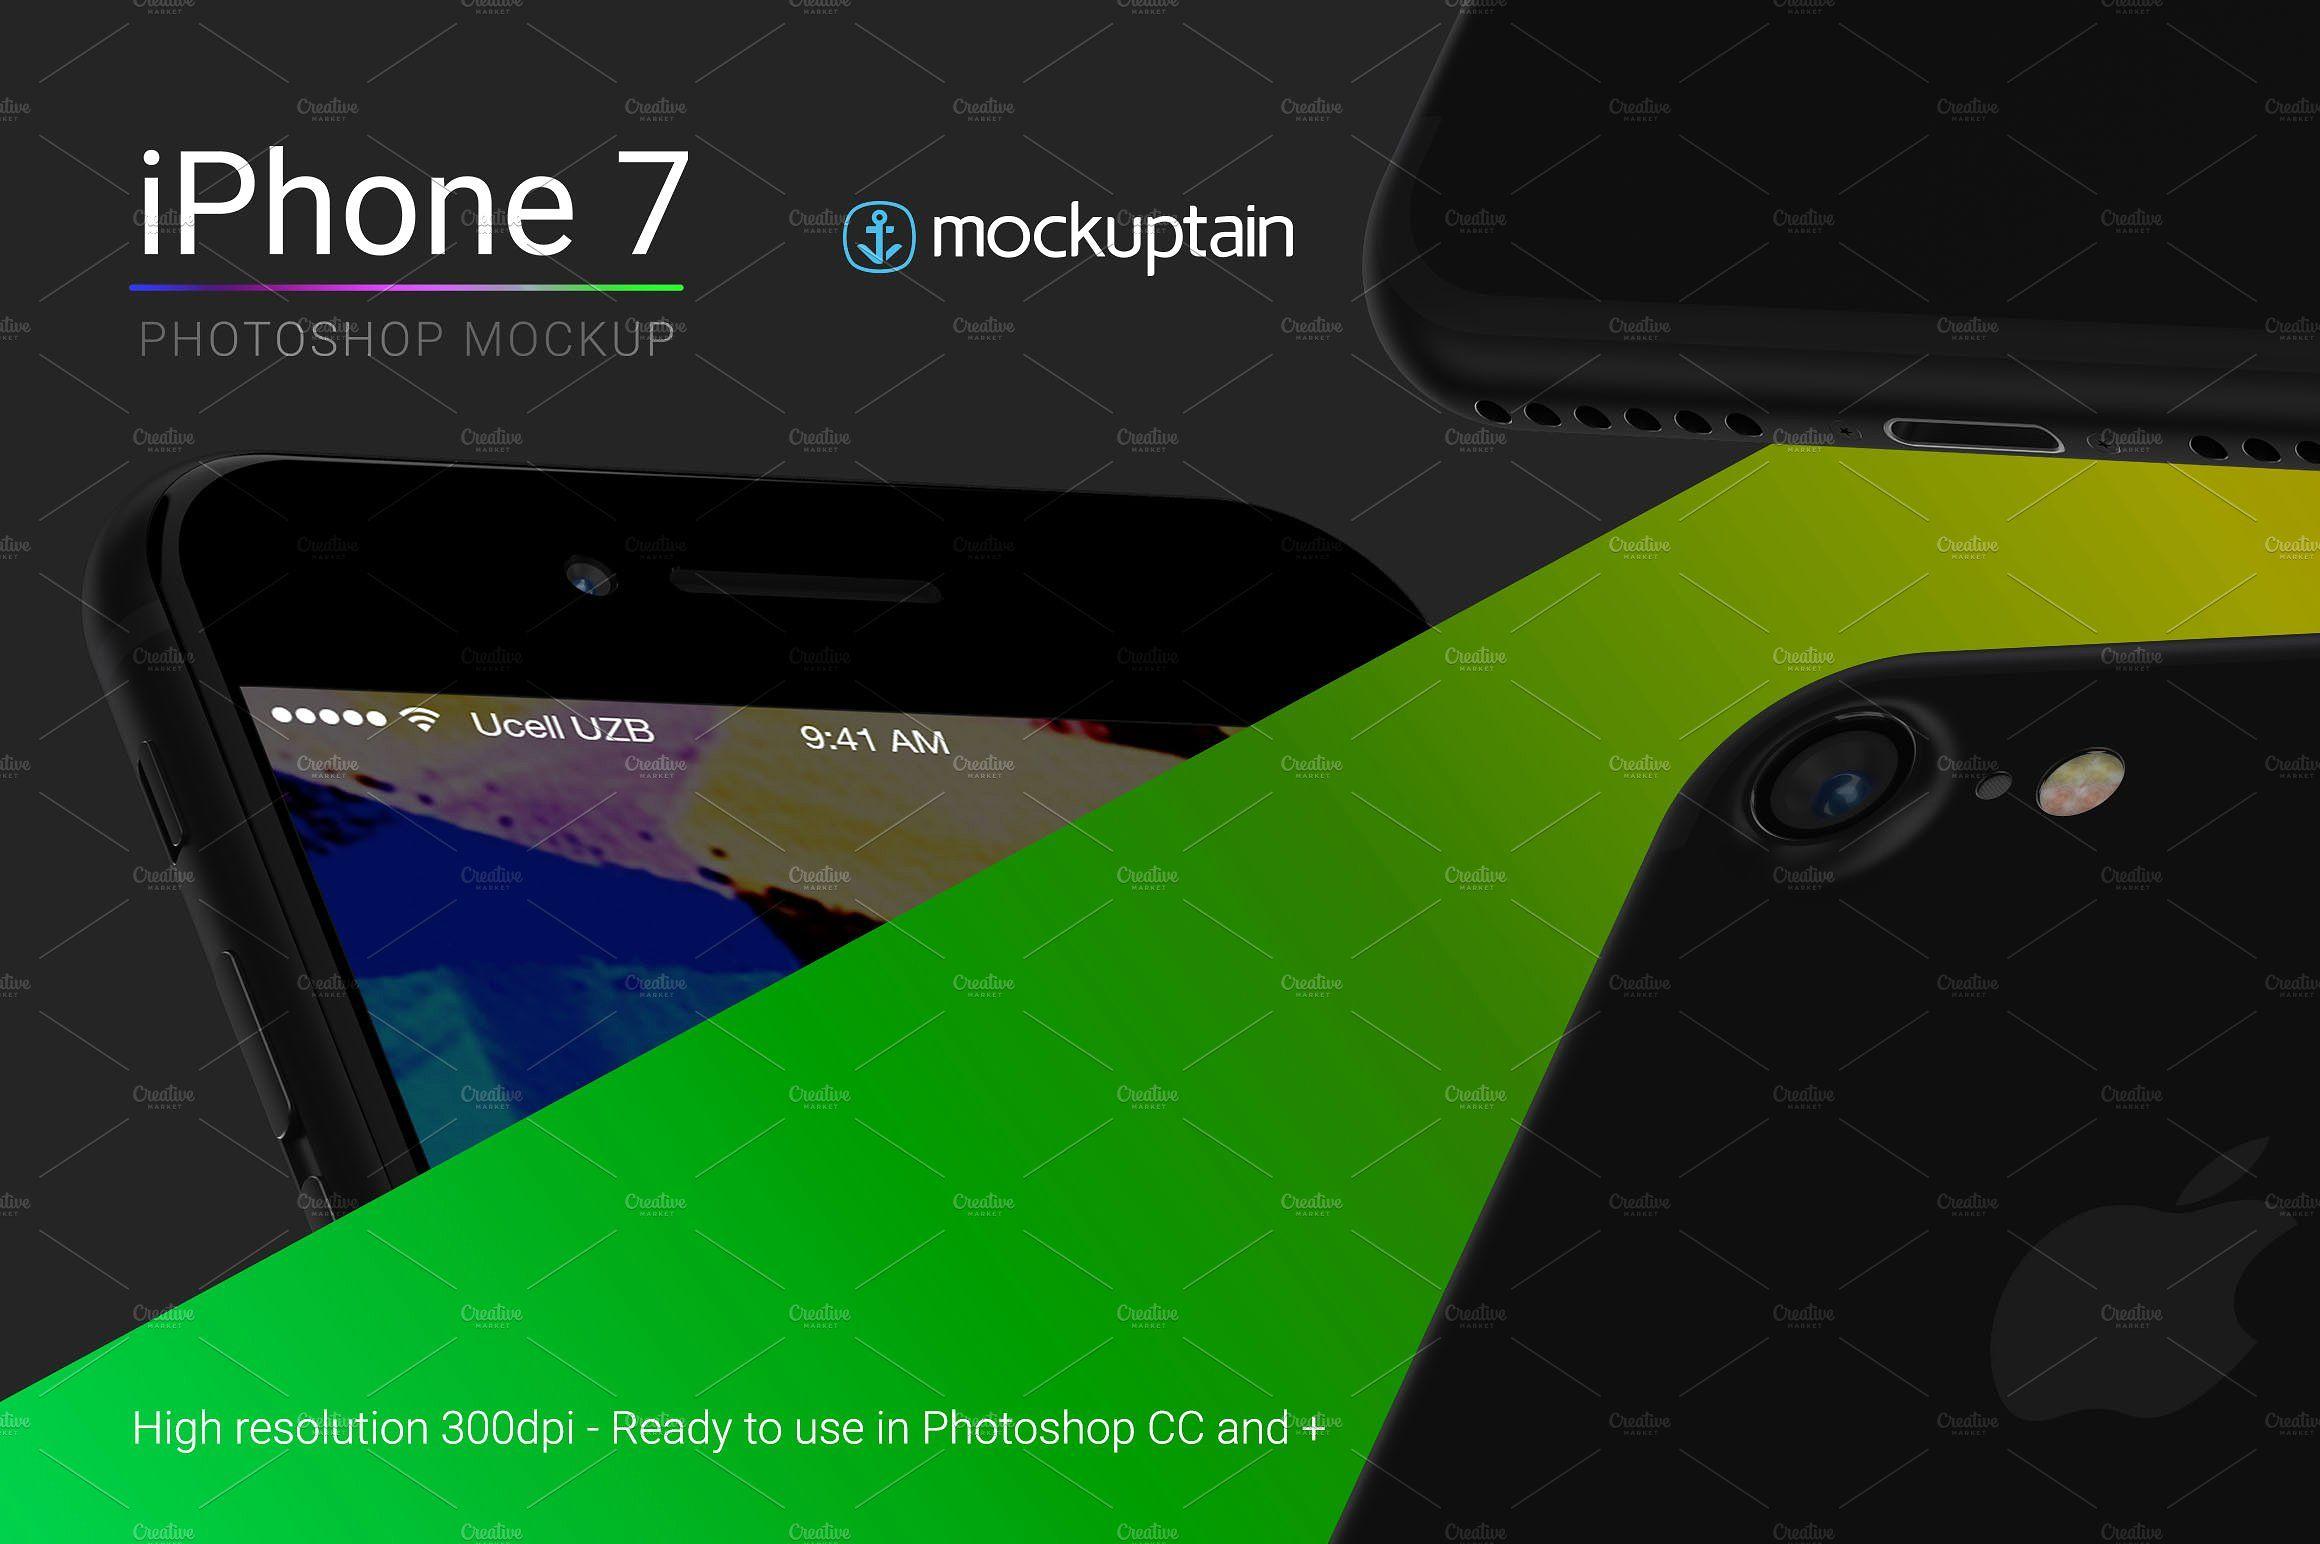 Iphone 7 Mockup Flying Black Iphone Mockup Personal Presentation Black Iphone 7